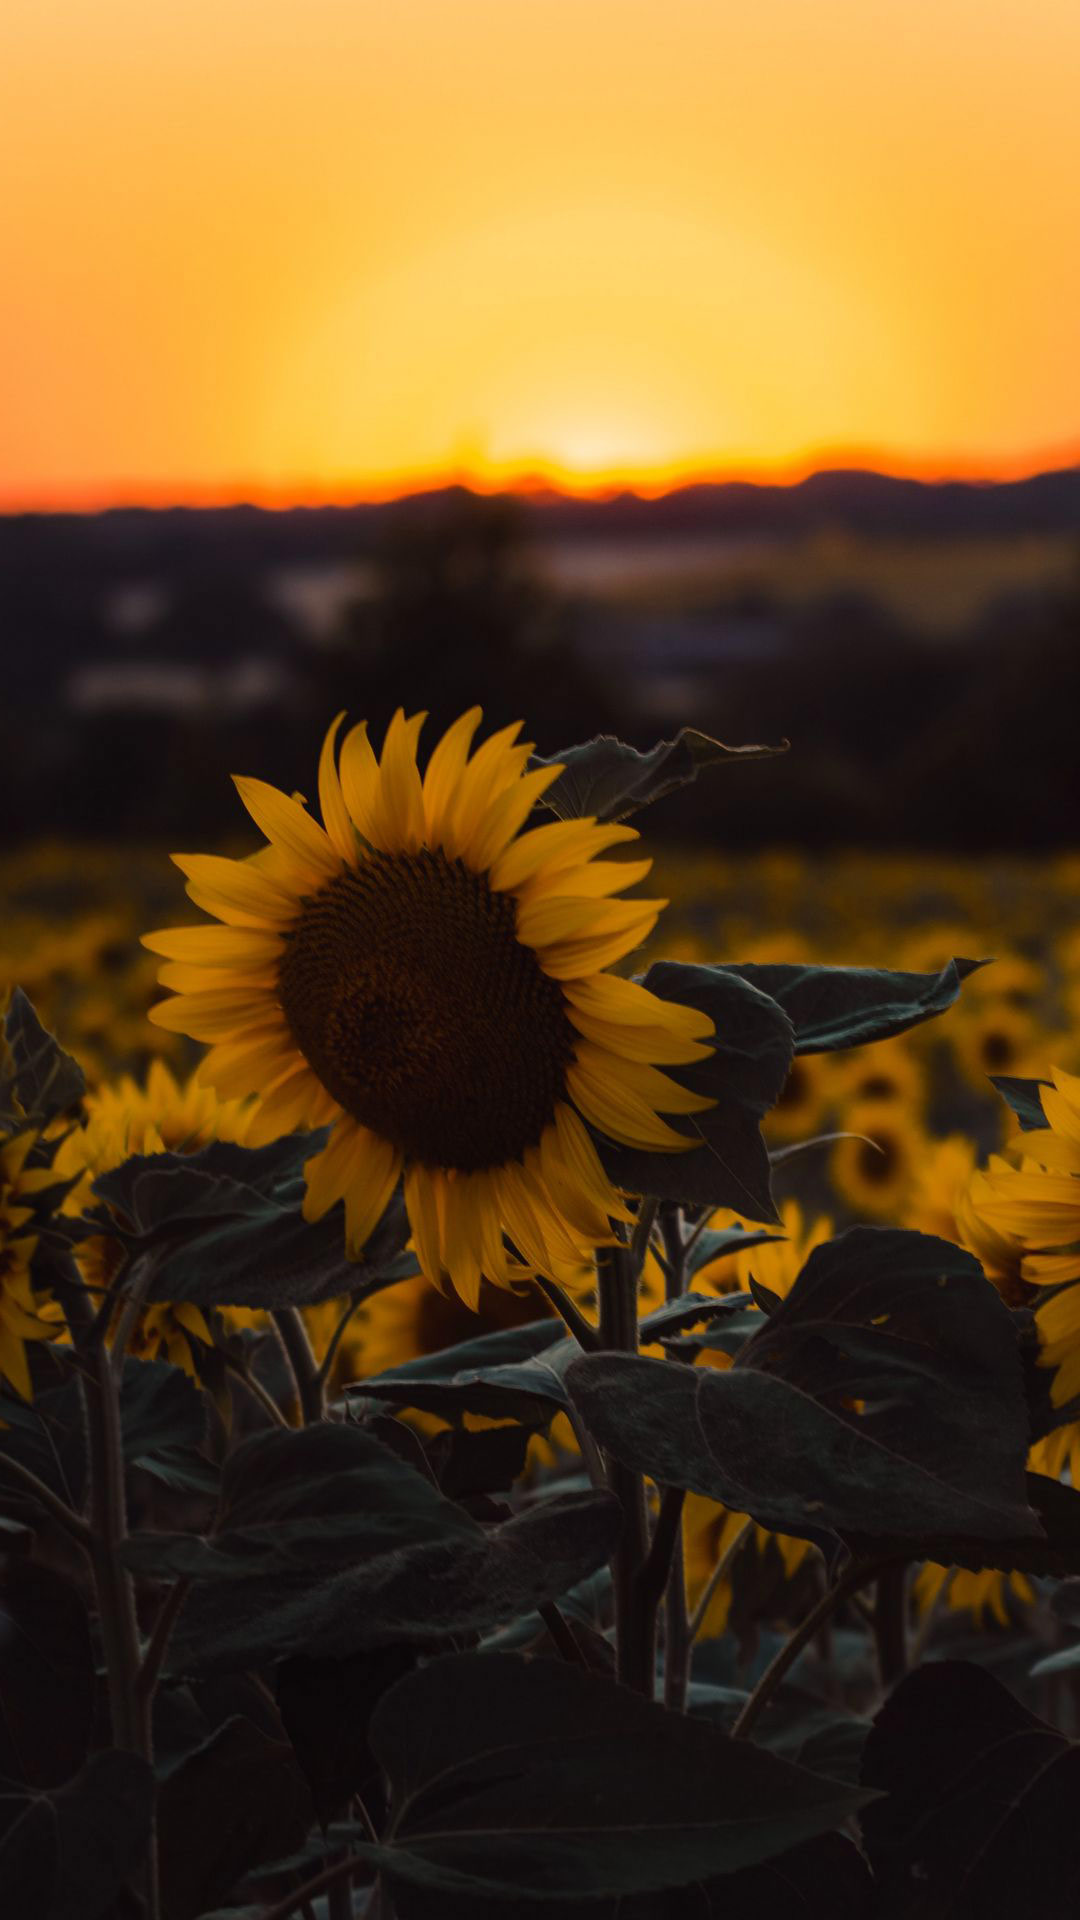 Yellow Sunflower Sunset iPhone Wallpaper